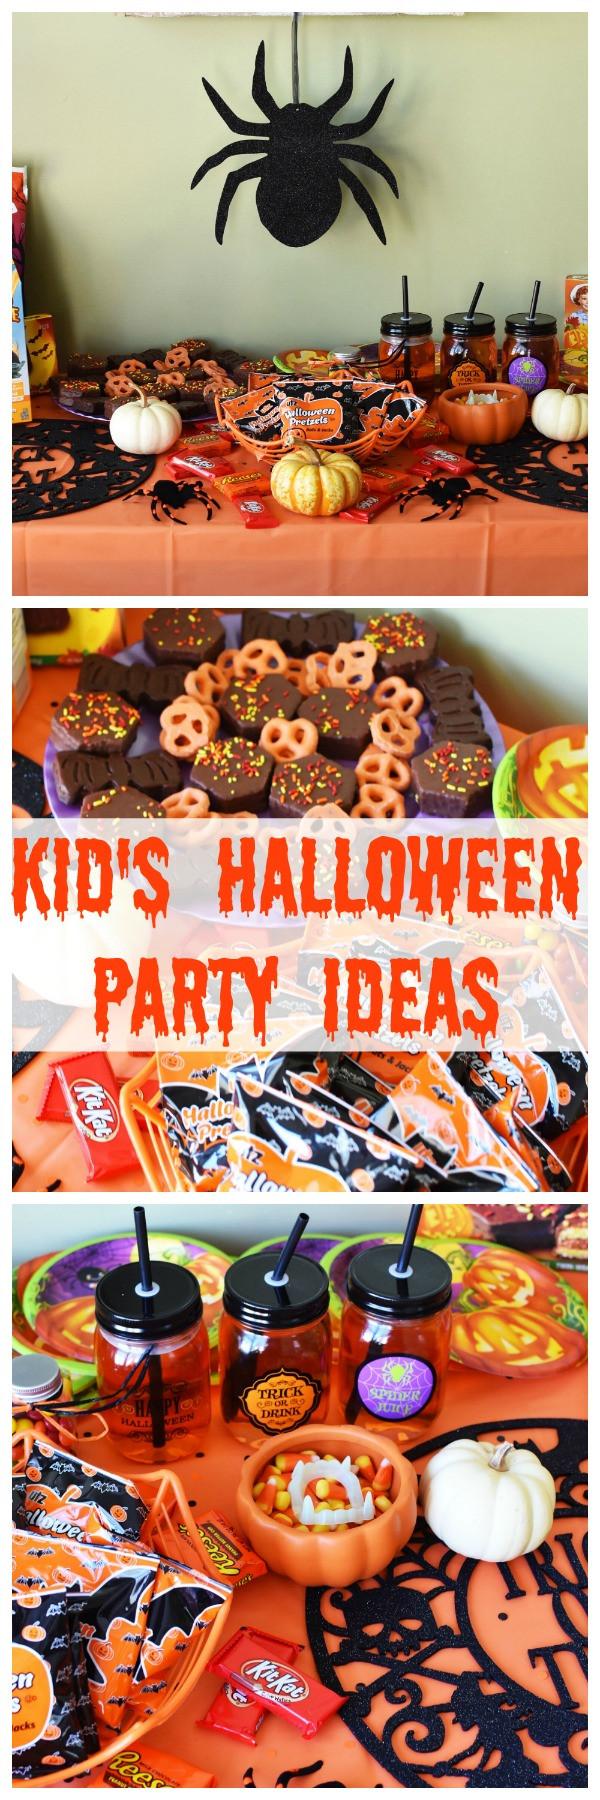 Family Halloween Party Ideas  Kid s Halloween Party Ideas